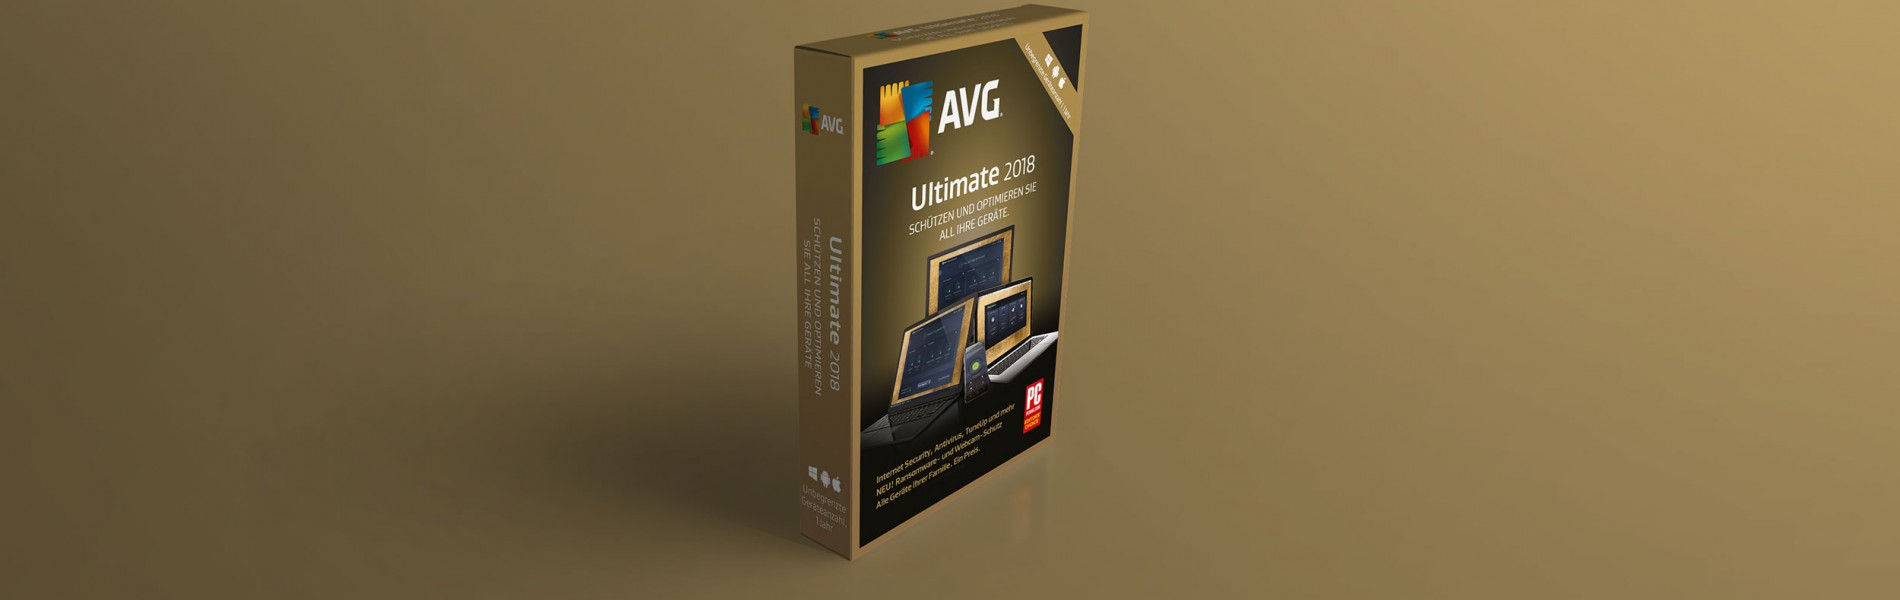 AVG Ultimate 2018 – unbegrenzte Geräte